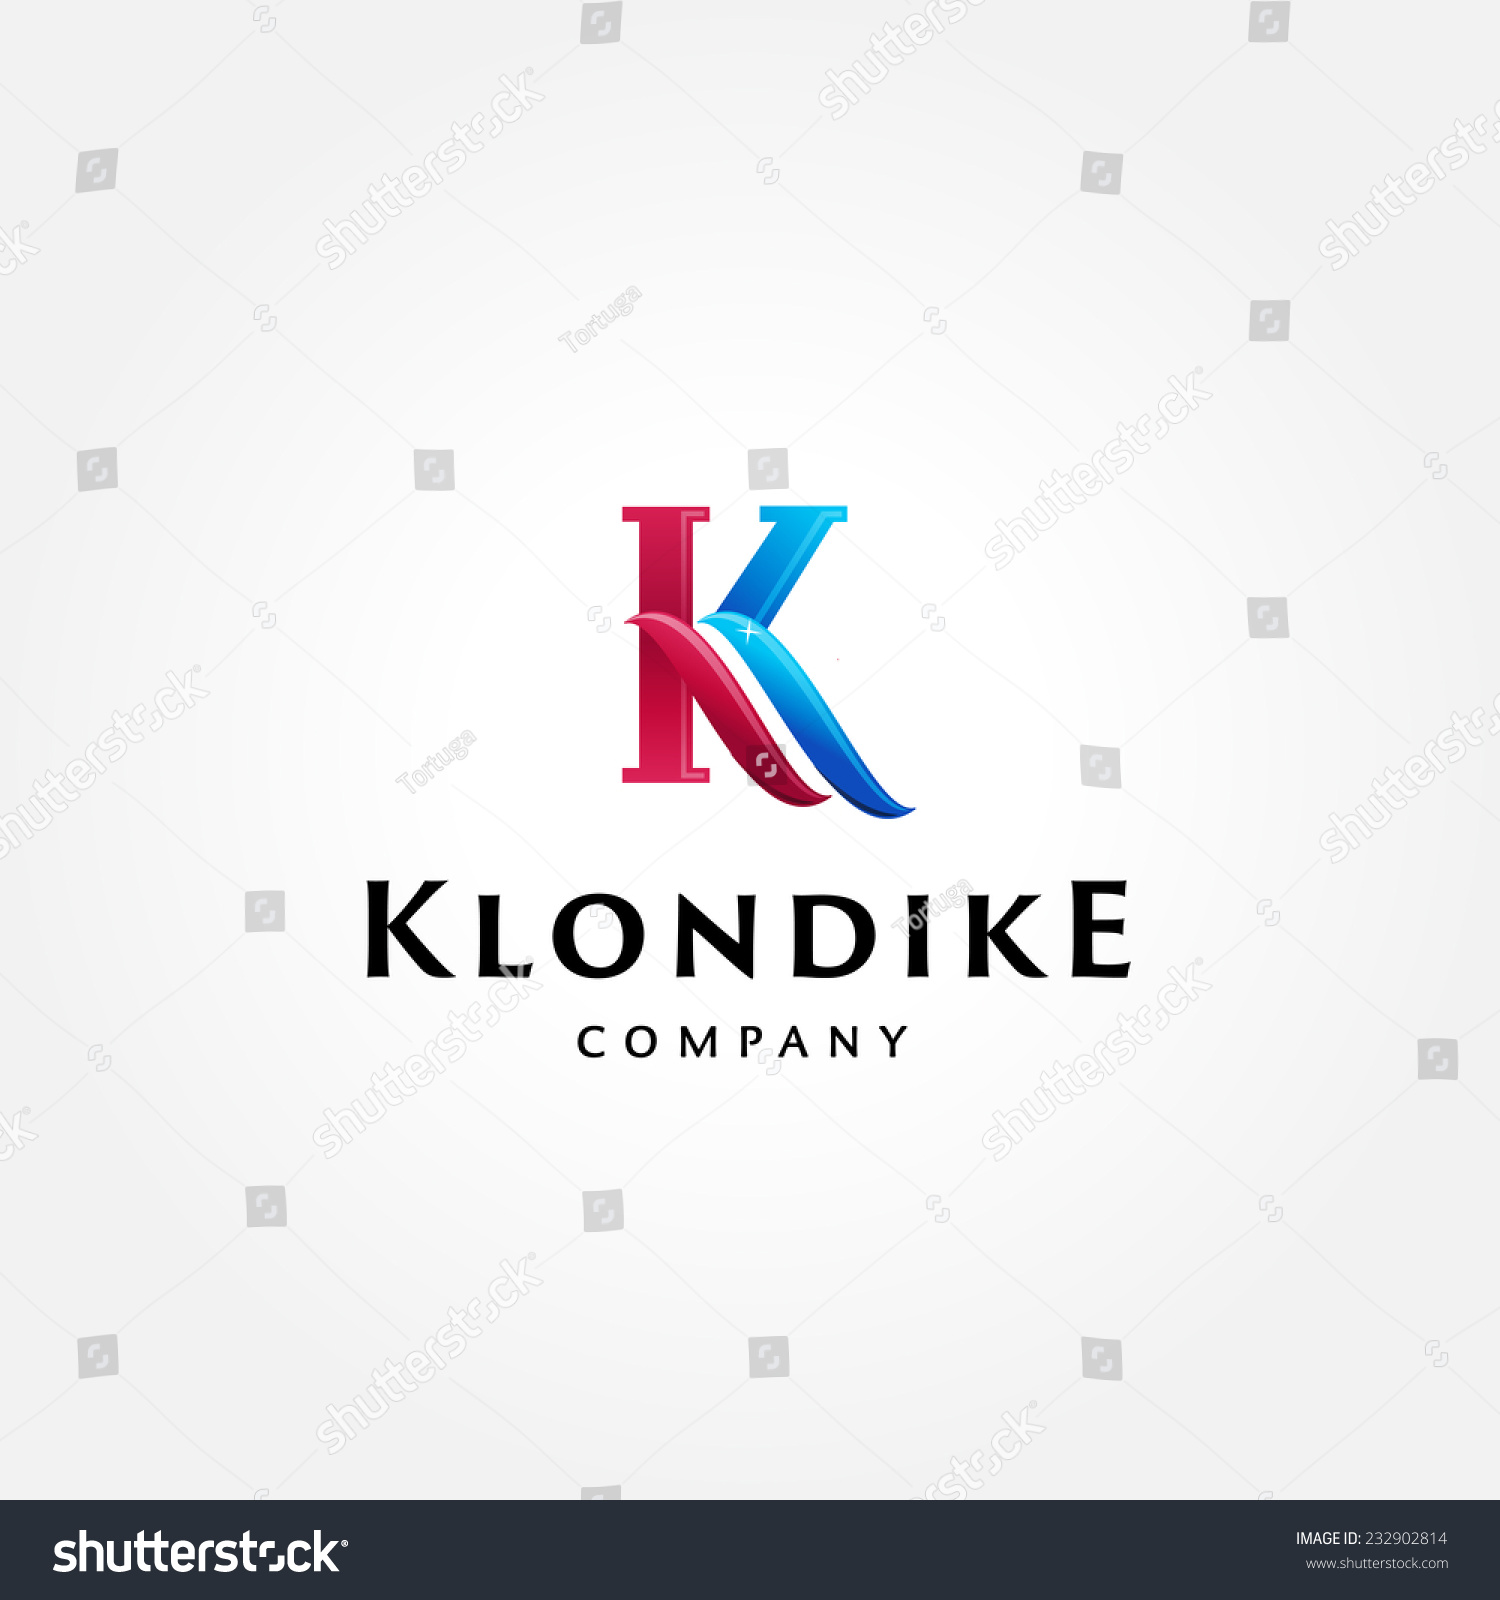 stylish typographic logo template letter k のベクター画像素材